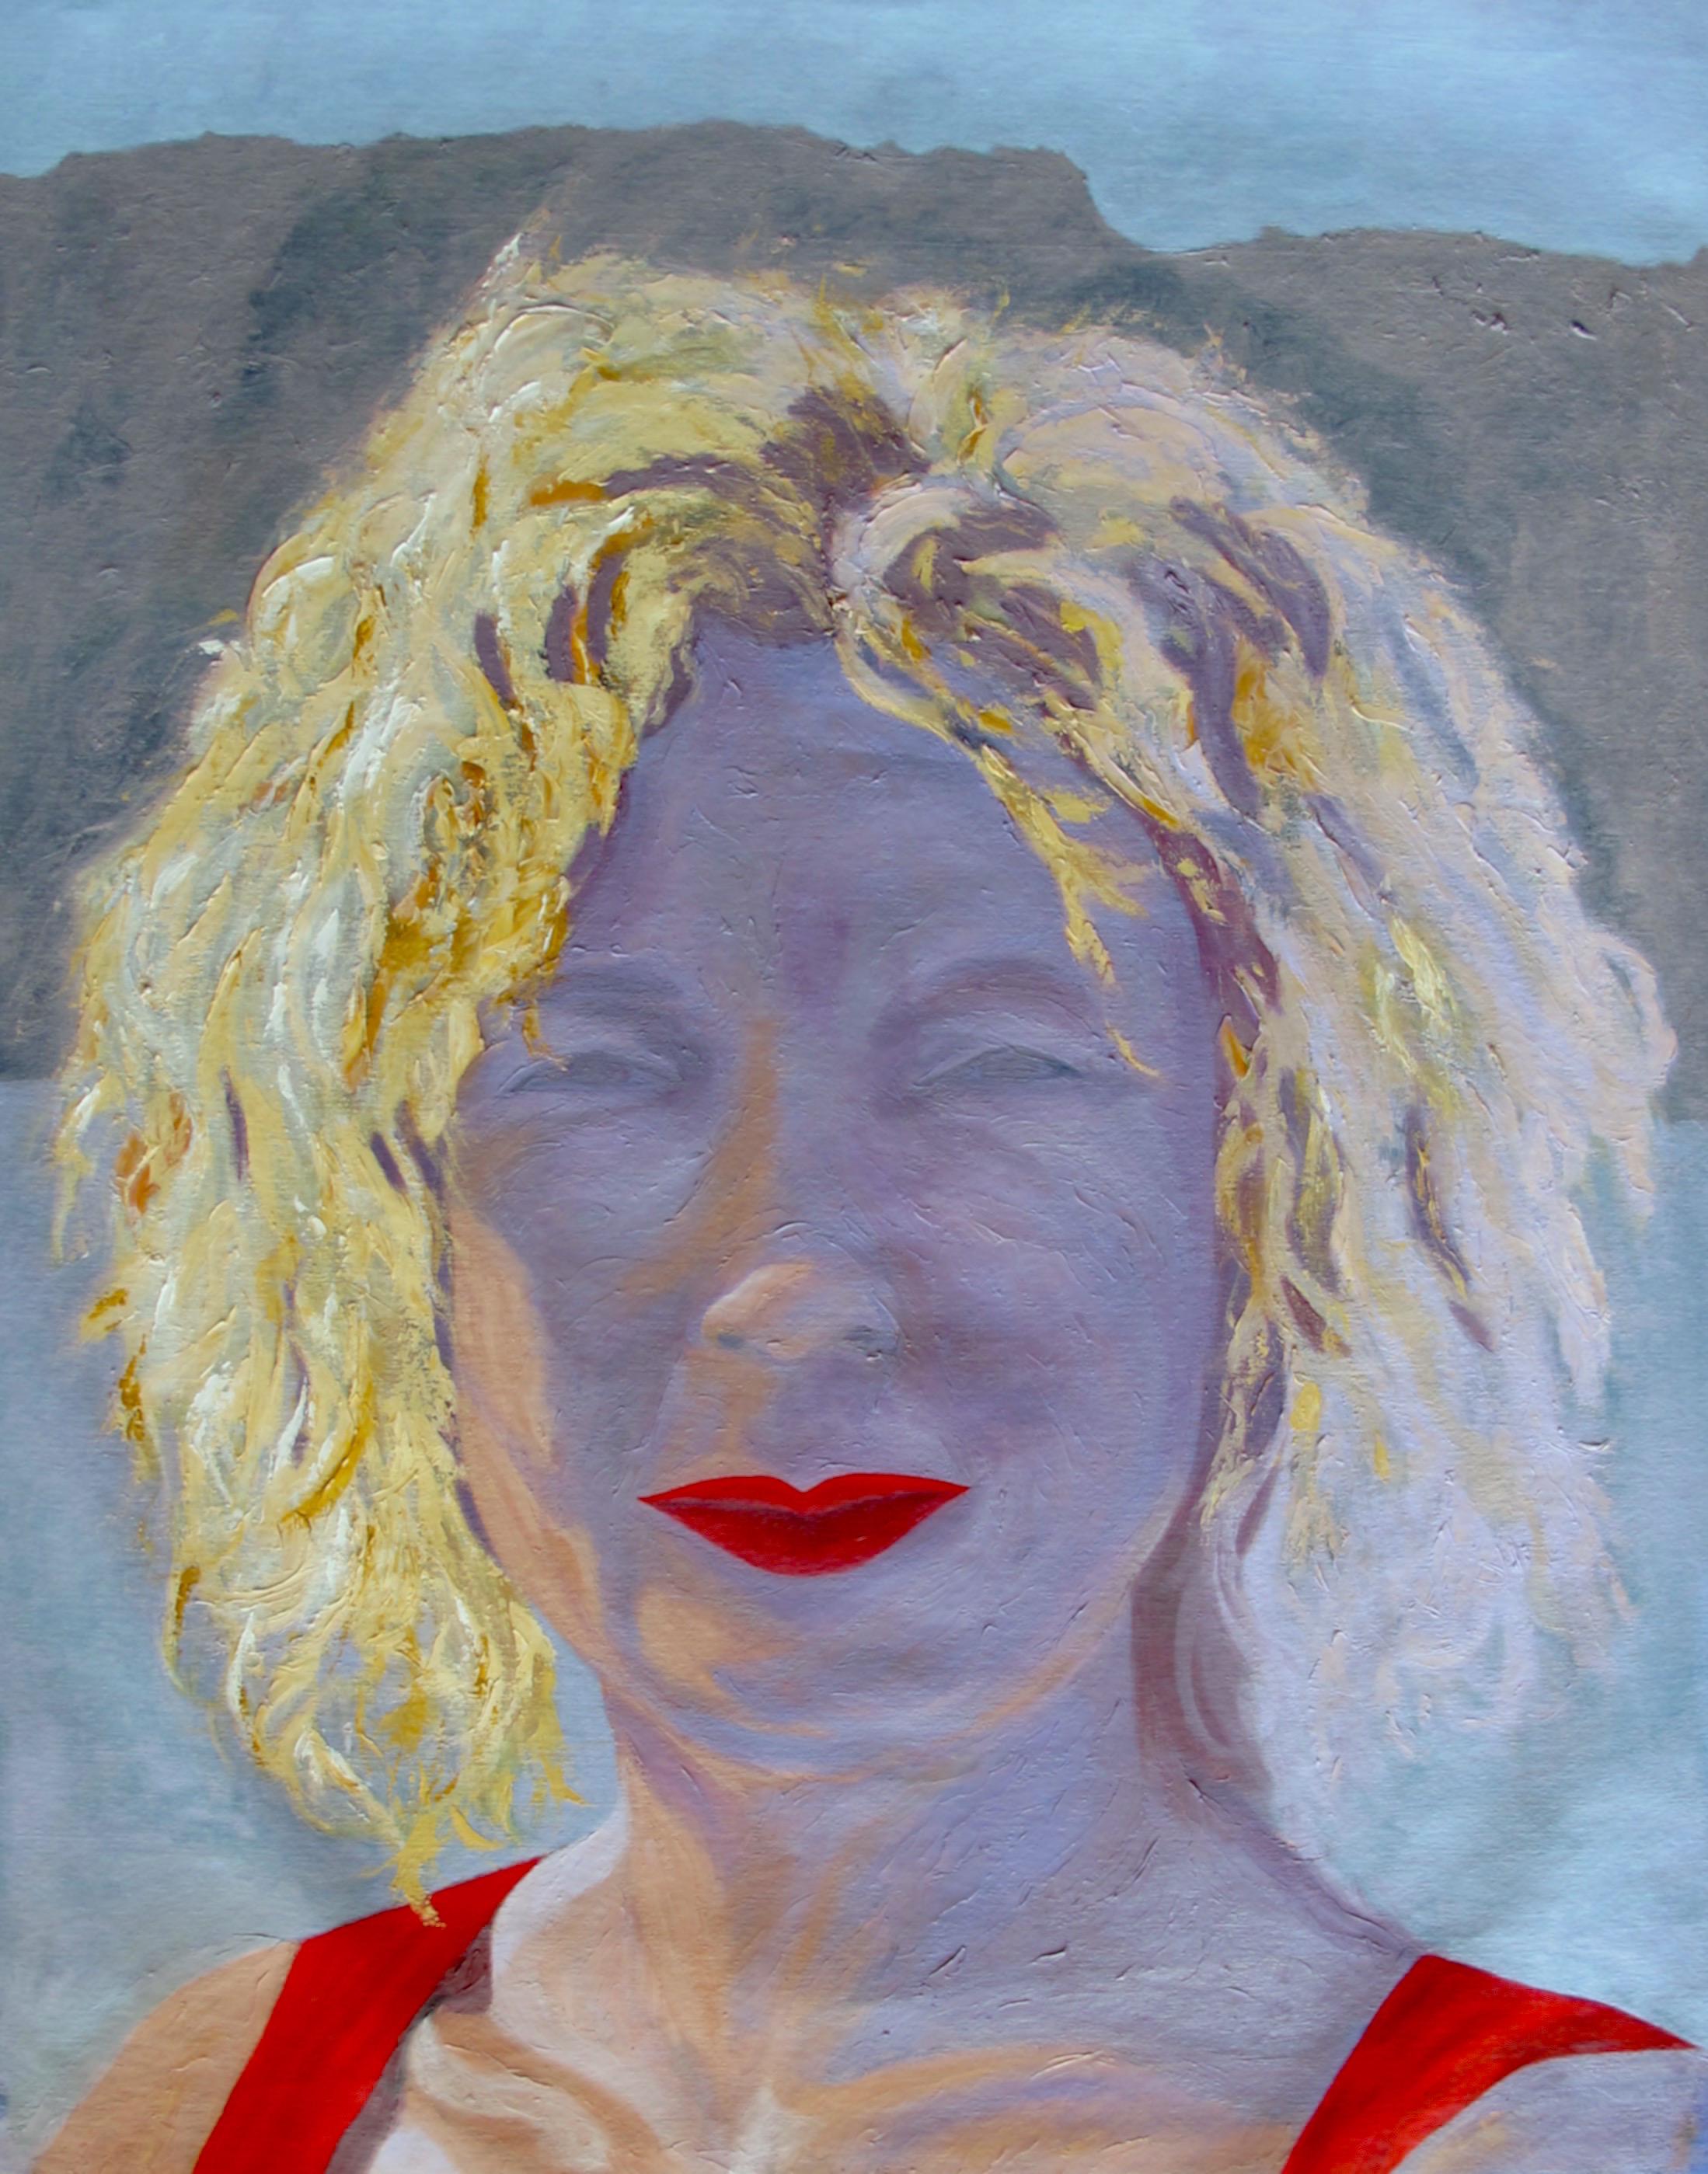 Daphne : 120 X 135 cm oil on canvas